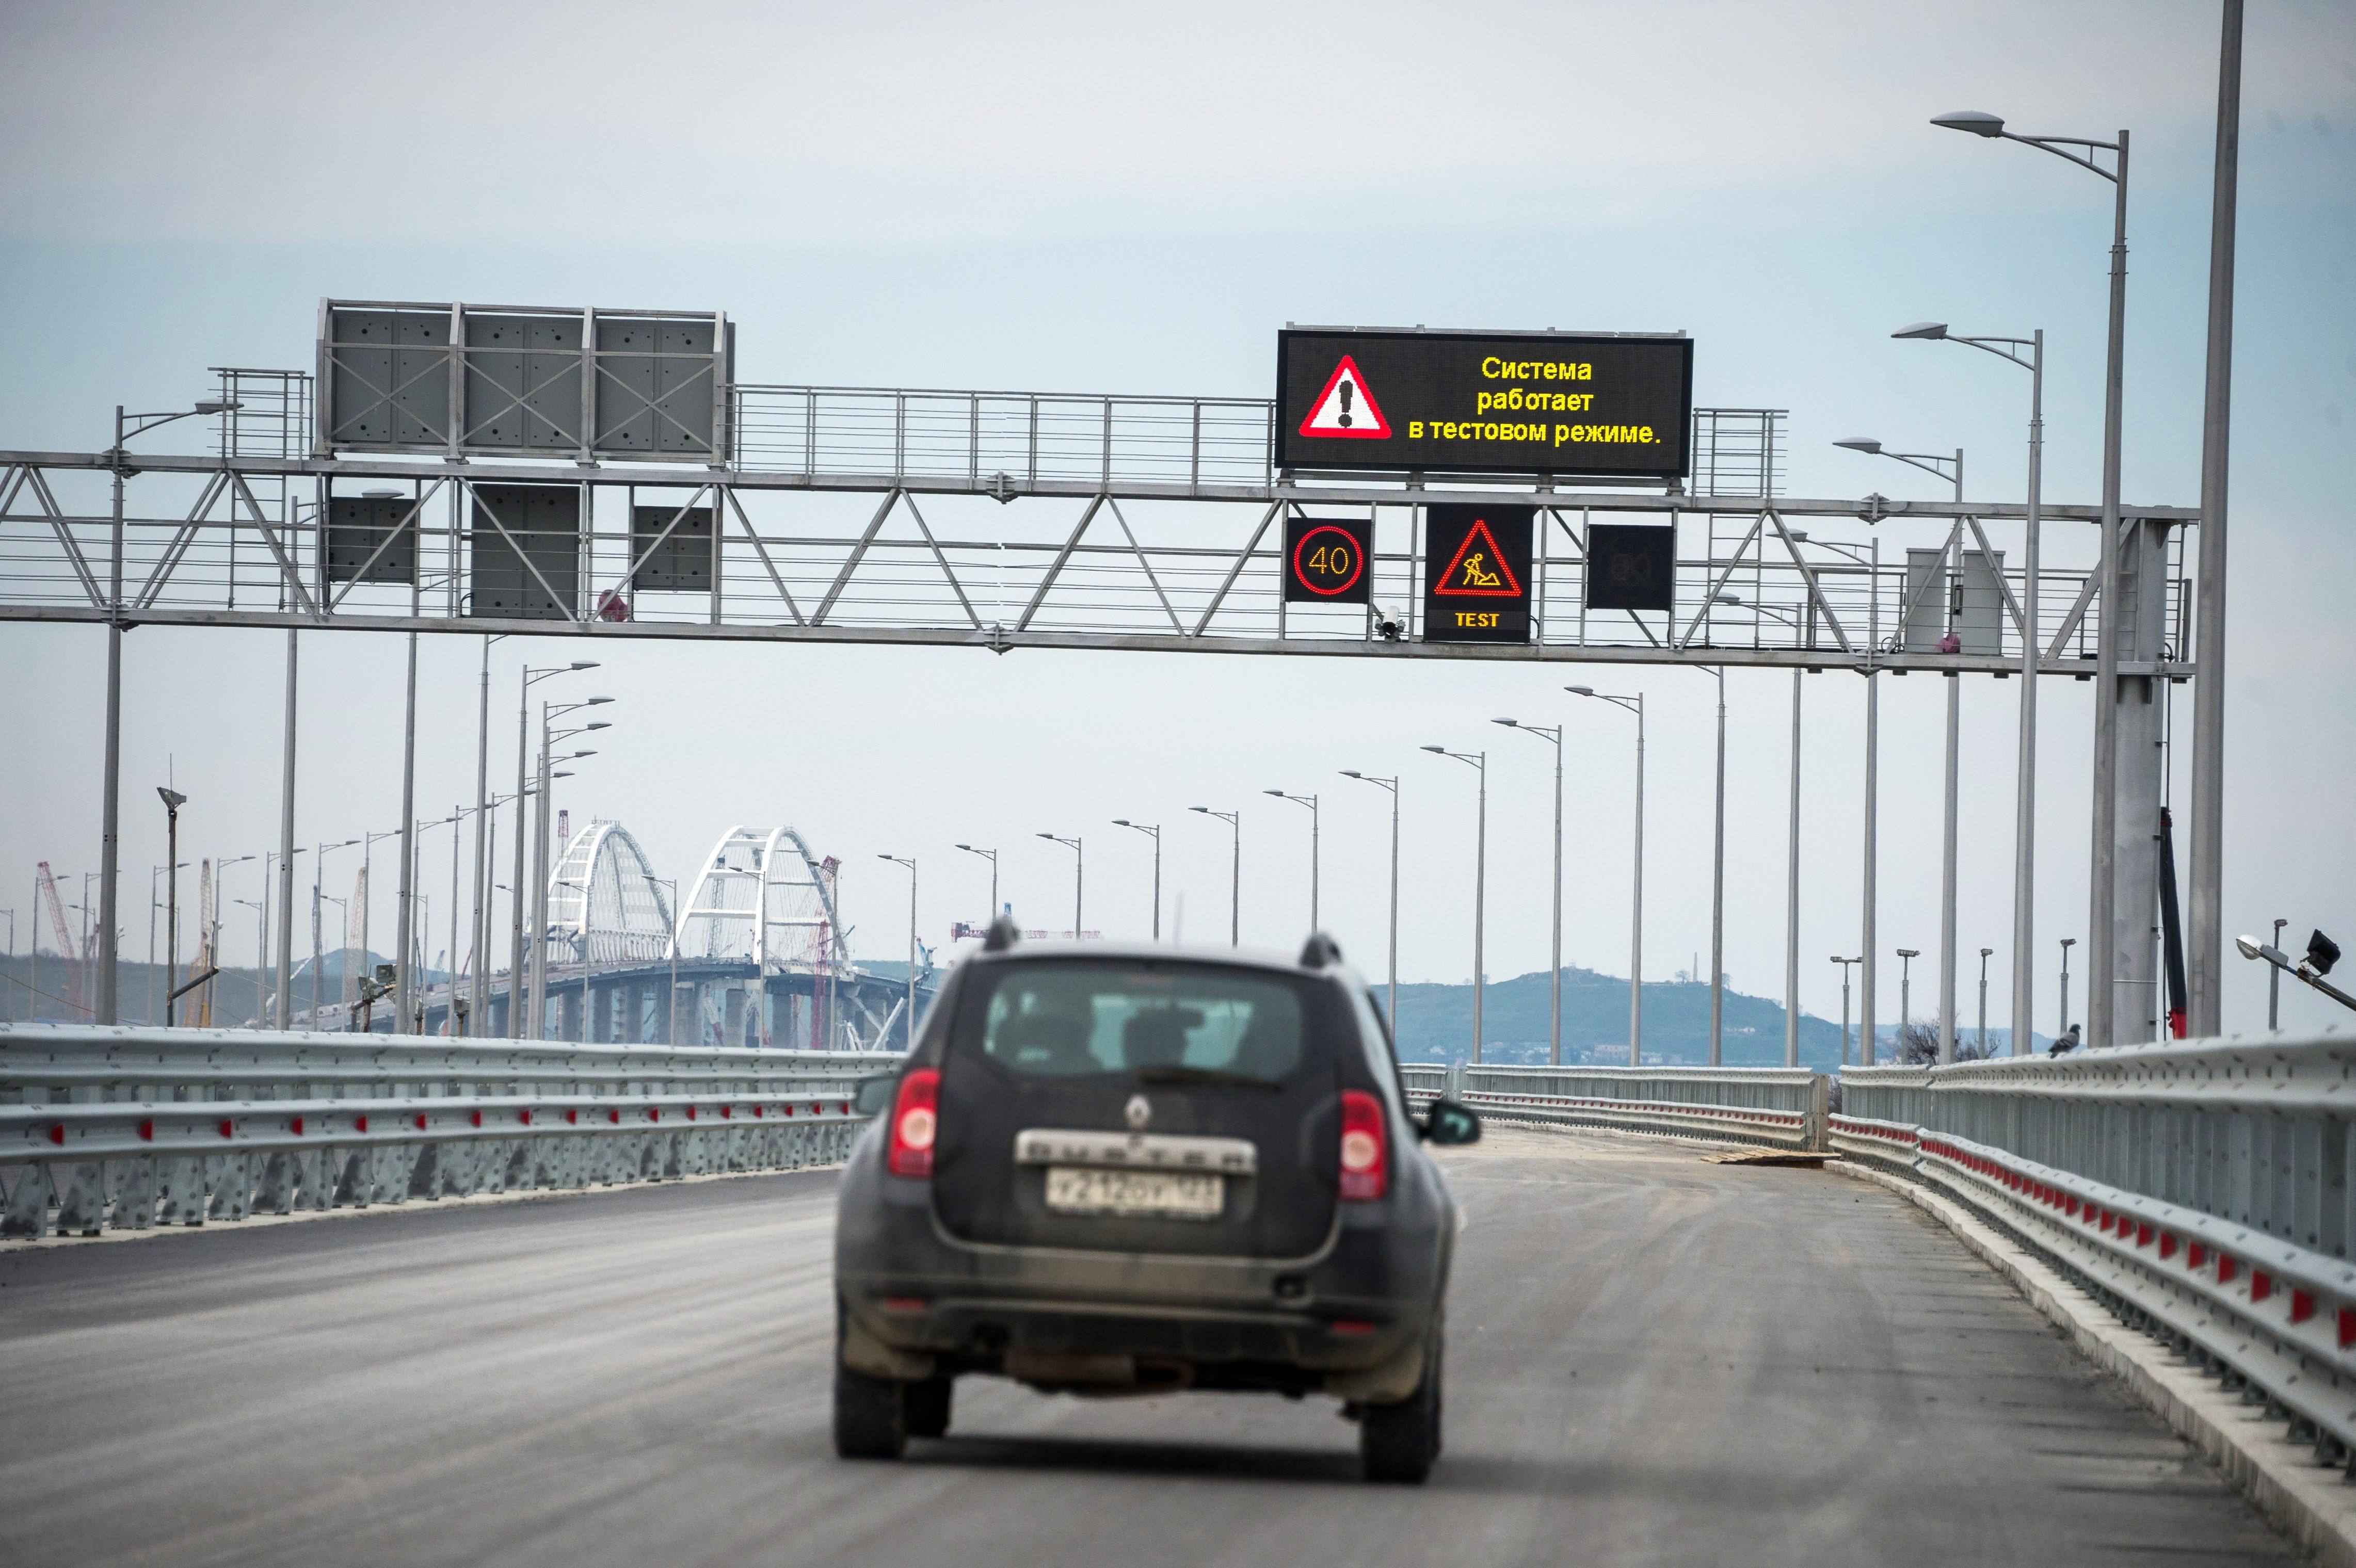 <p>Фото: &copy;РИА Новости/Алексей Мальгавко</p>